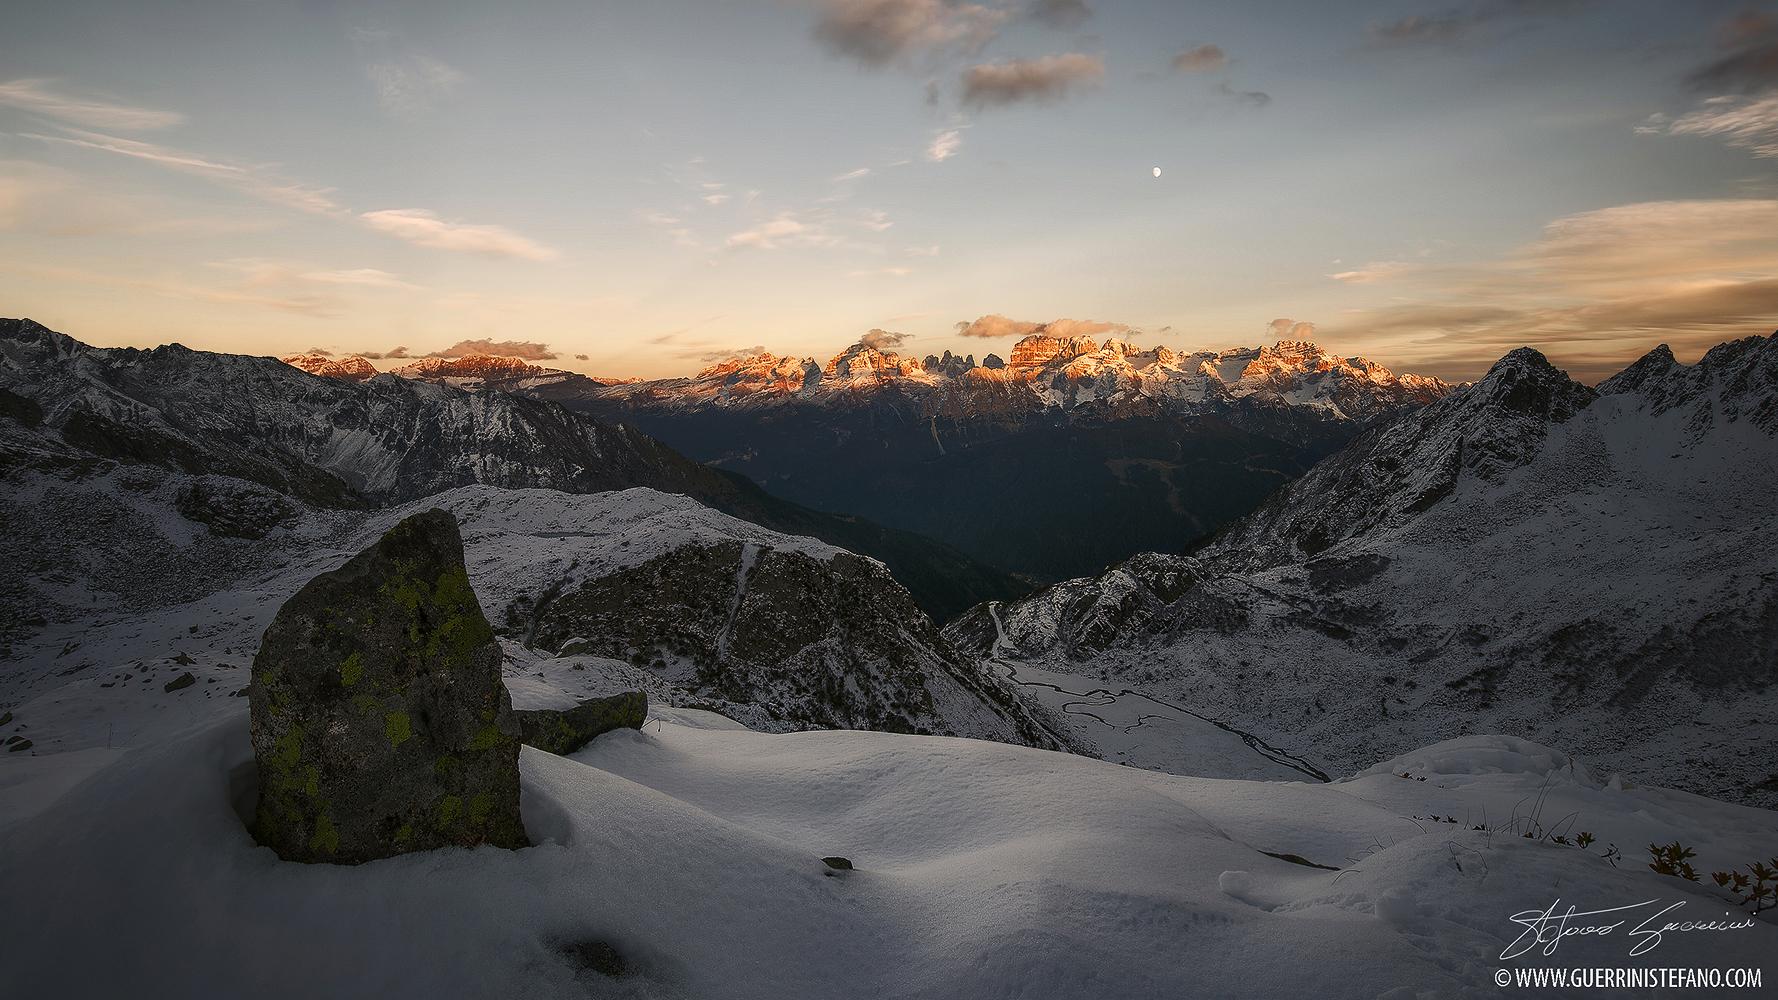 tramonto-val-damola-16-9-1000-by-guerrini-stefano